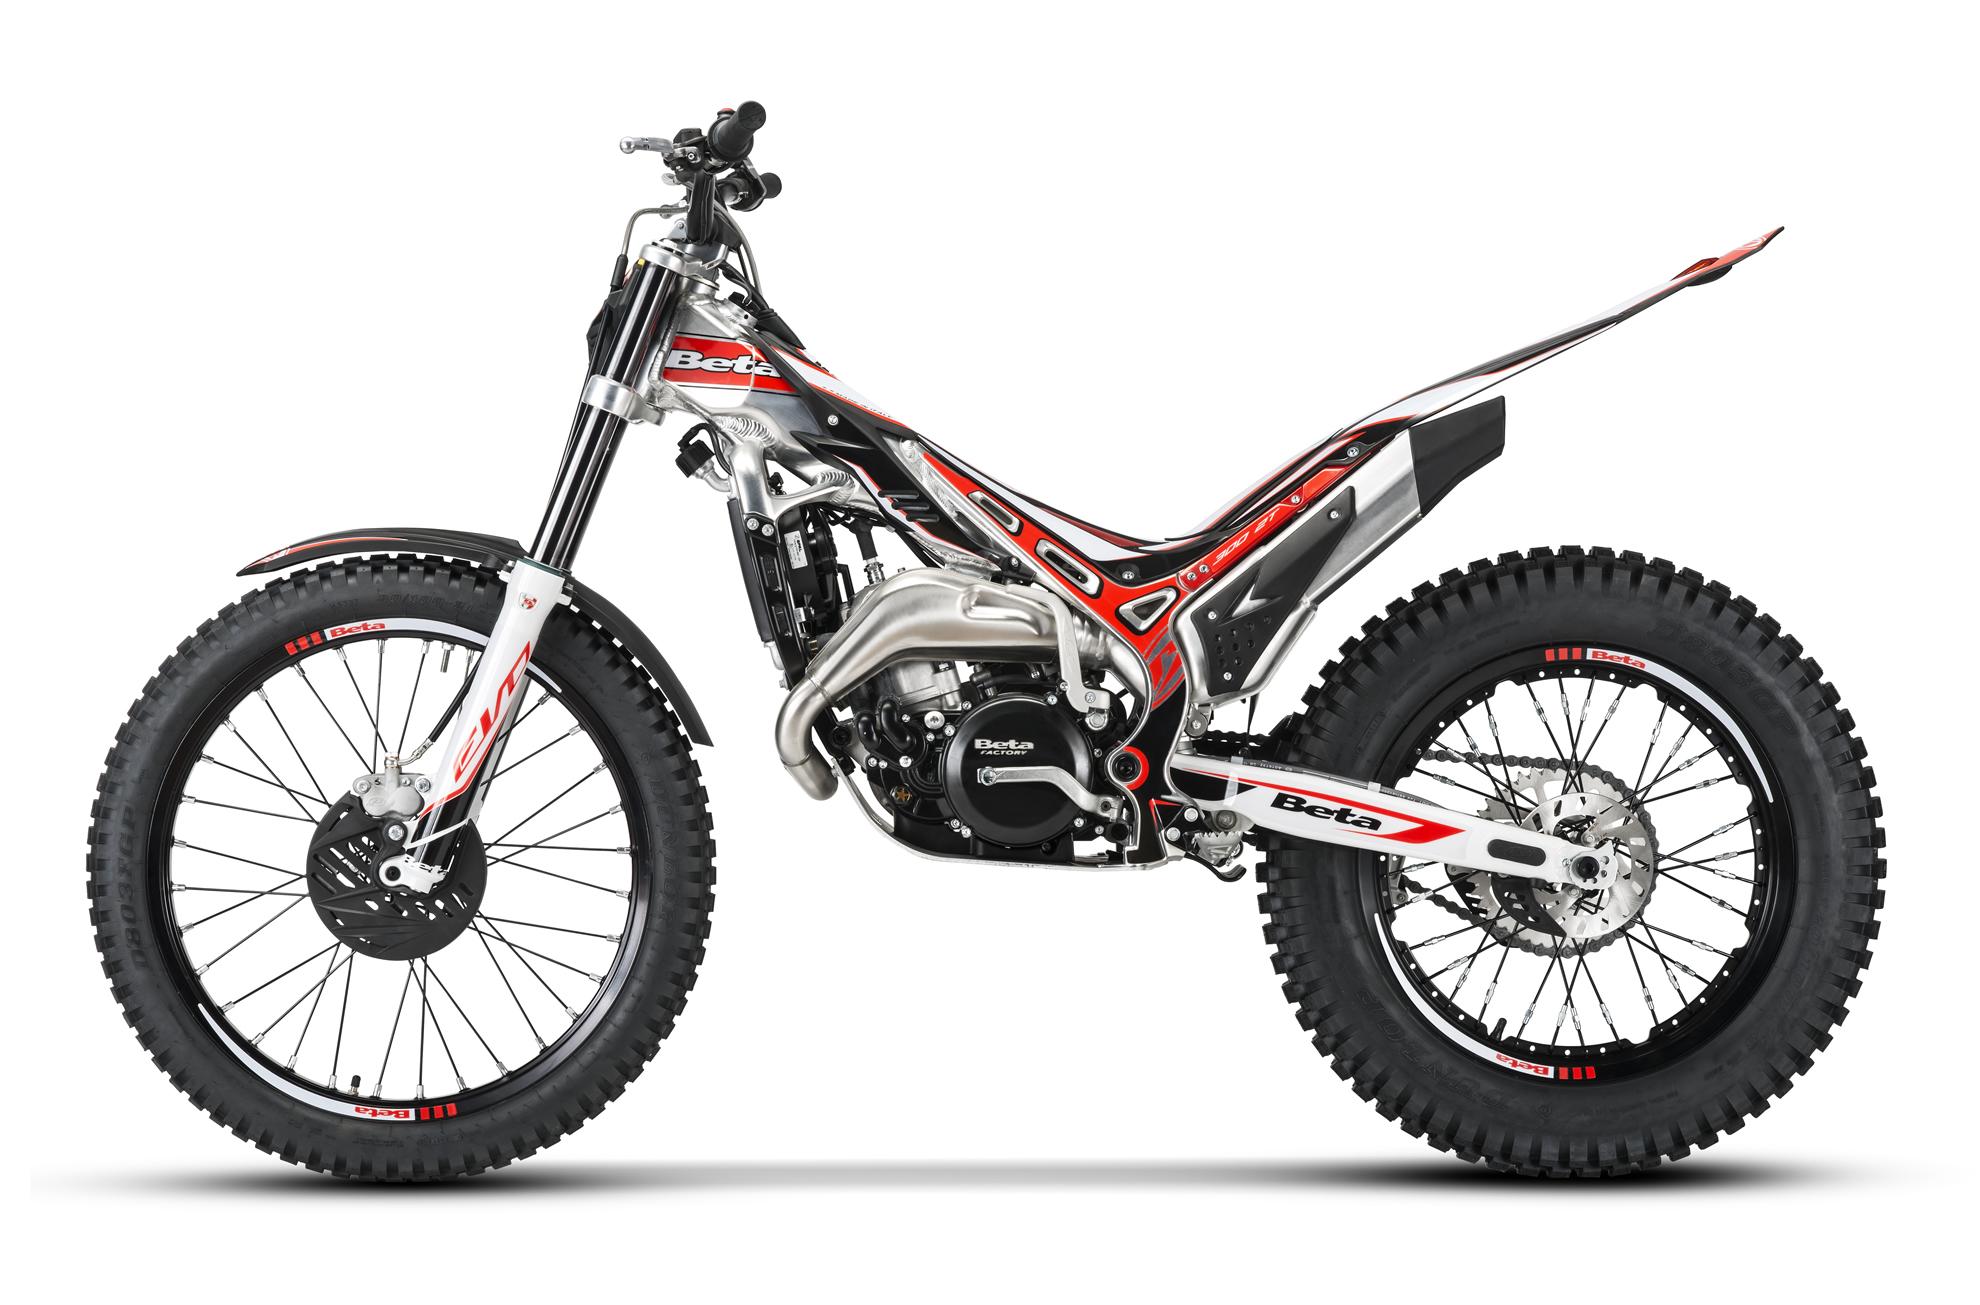 Yamaha Dt400 Enduro Images Of Home Design Wiring Diagram Honda 125 Motorcycle Headlight Circuit